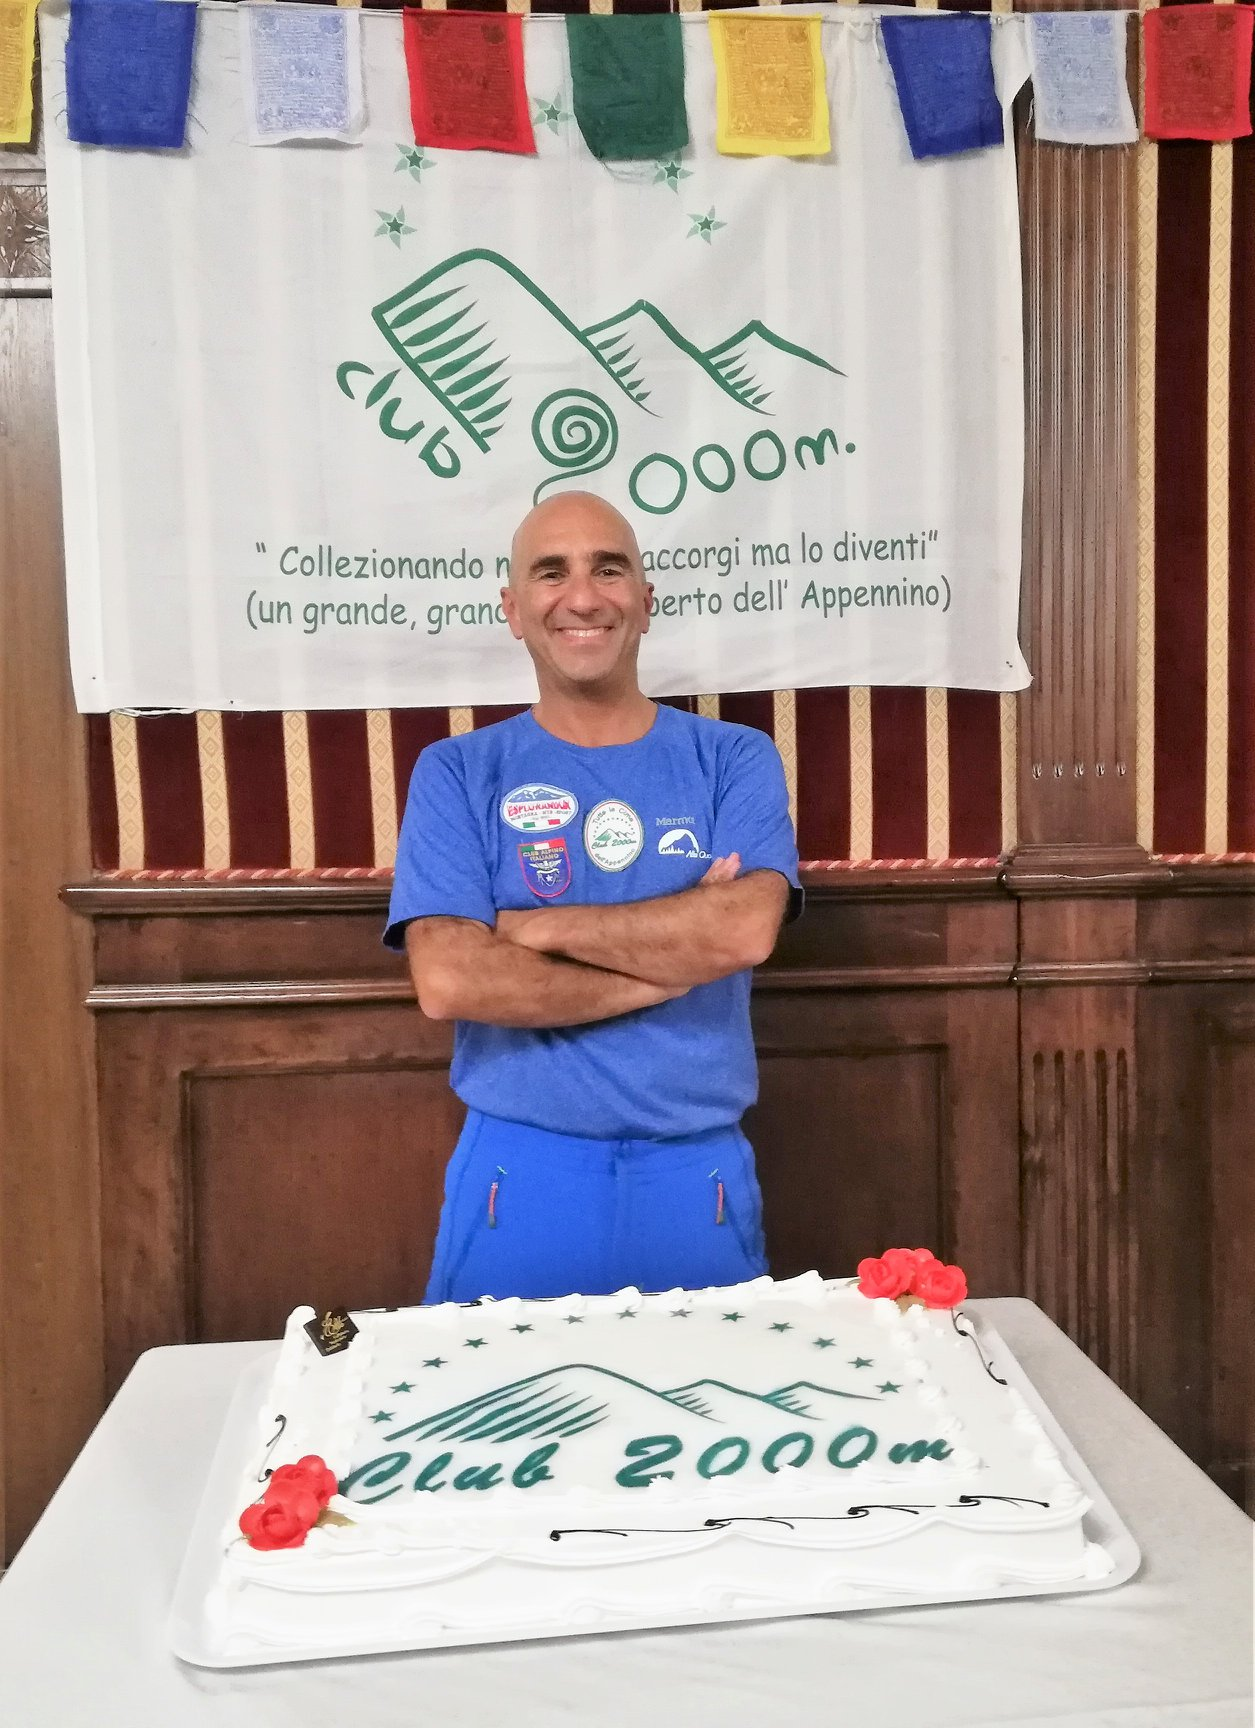 Francesco Mancini Club 2000m